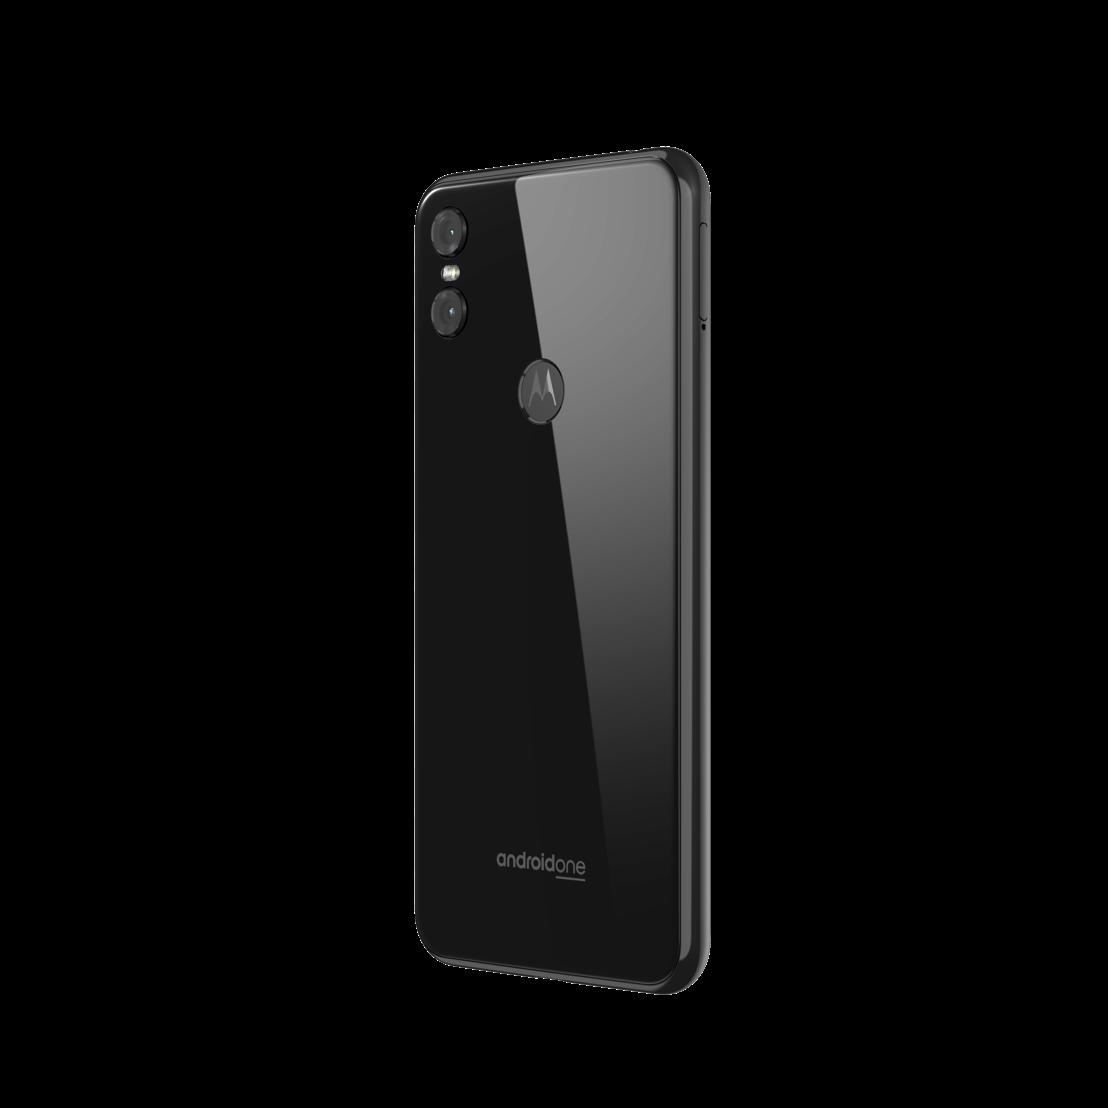 Motorola One Backside Right